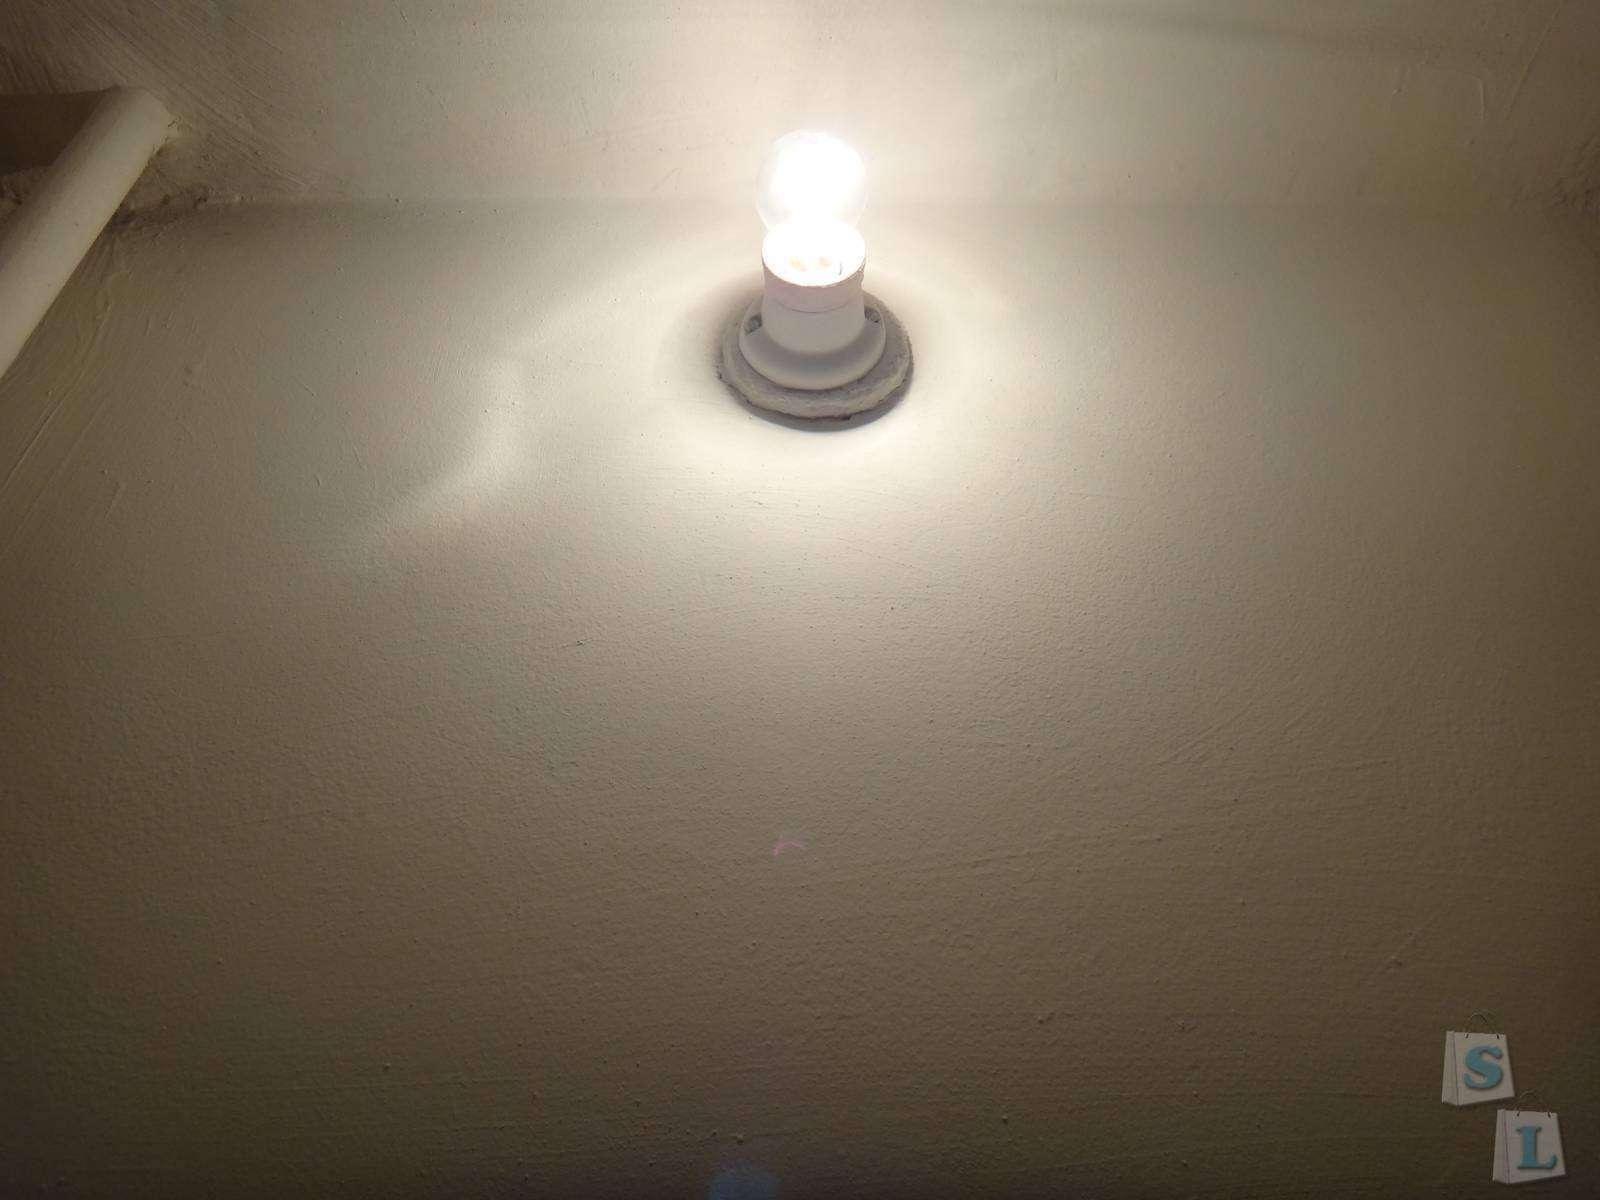 GearBest: Отличные LED лампы кукуруза для ванной и туалета HZLED 12W E27 60 x SMD 5630 6000K 960Lm LED Corn Lamp